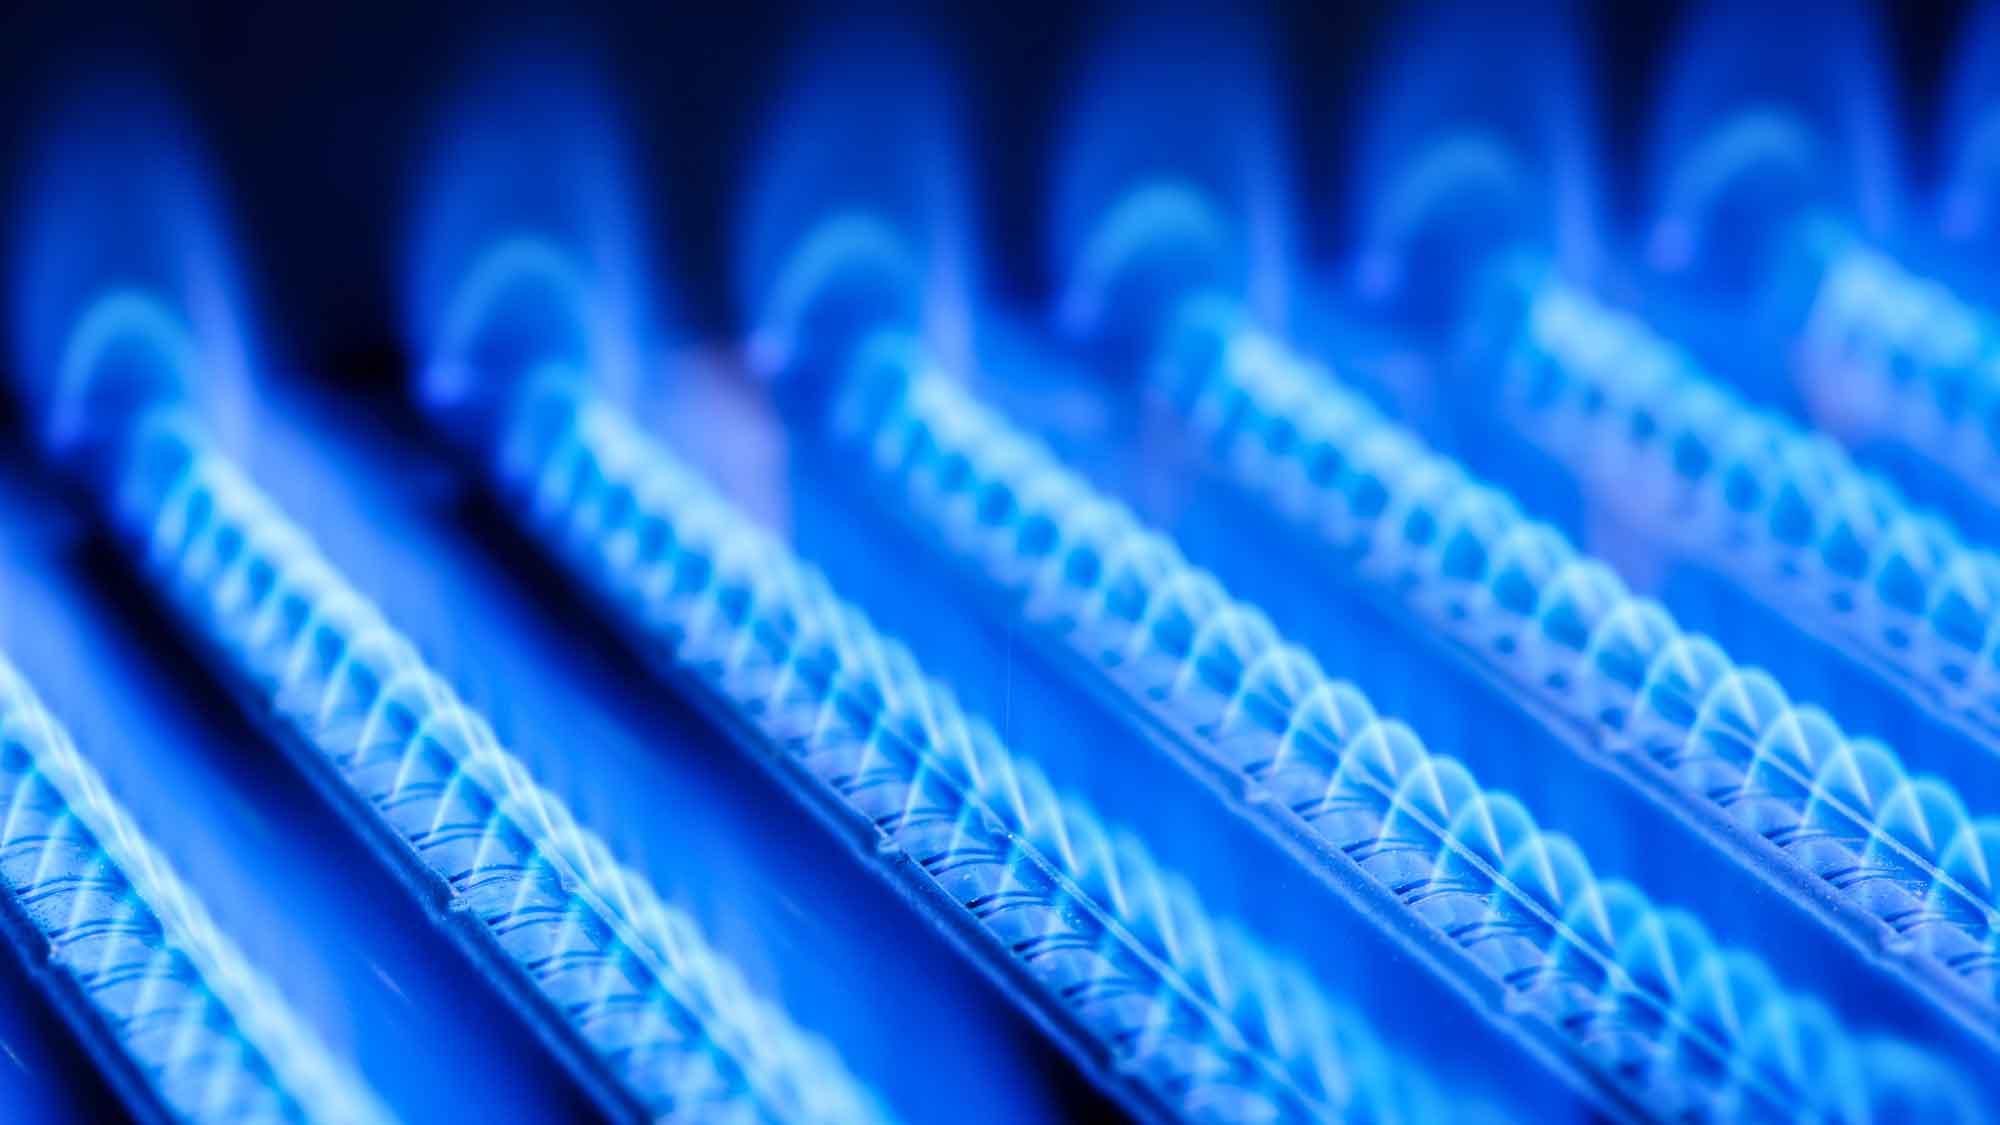 gas leak repair essex maintenance leigh on sea flame